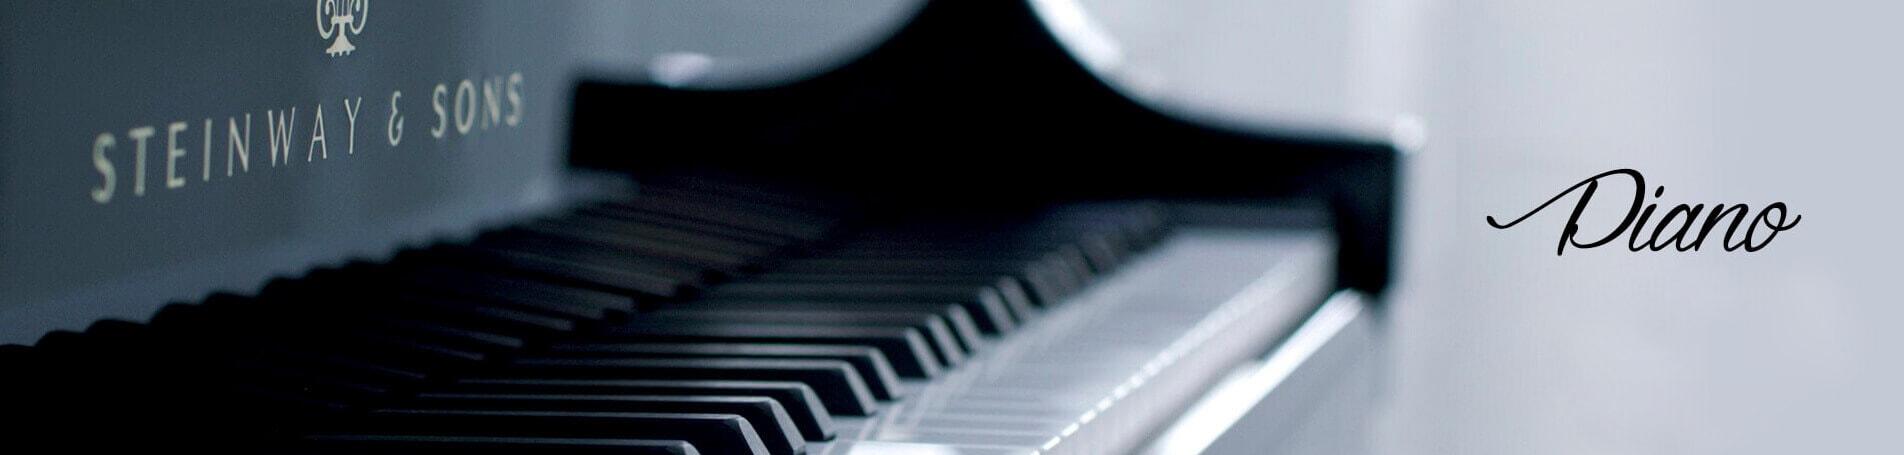 Piano Lessons Dubai - Melodica Music Center Dubai UAE